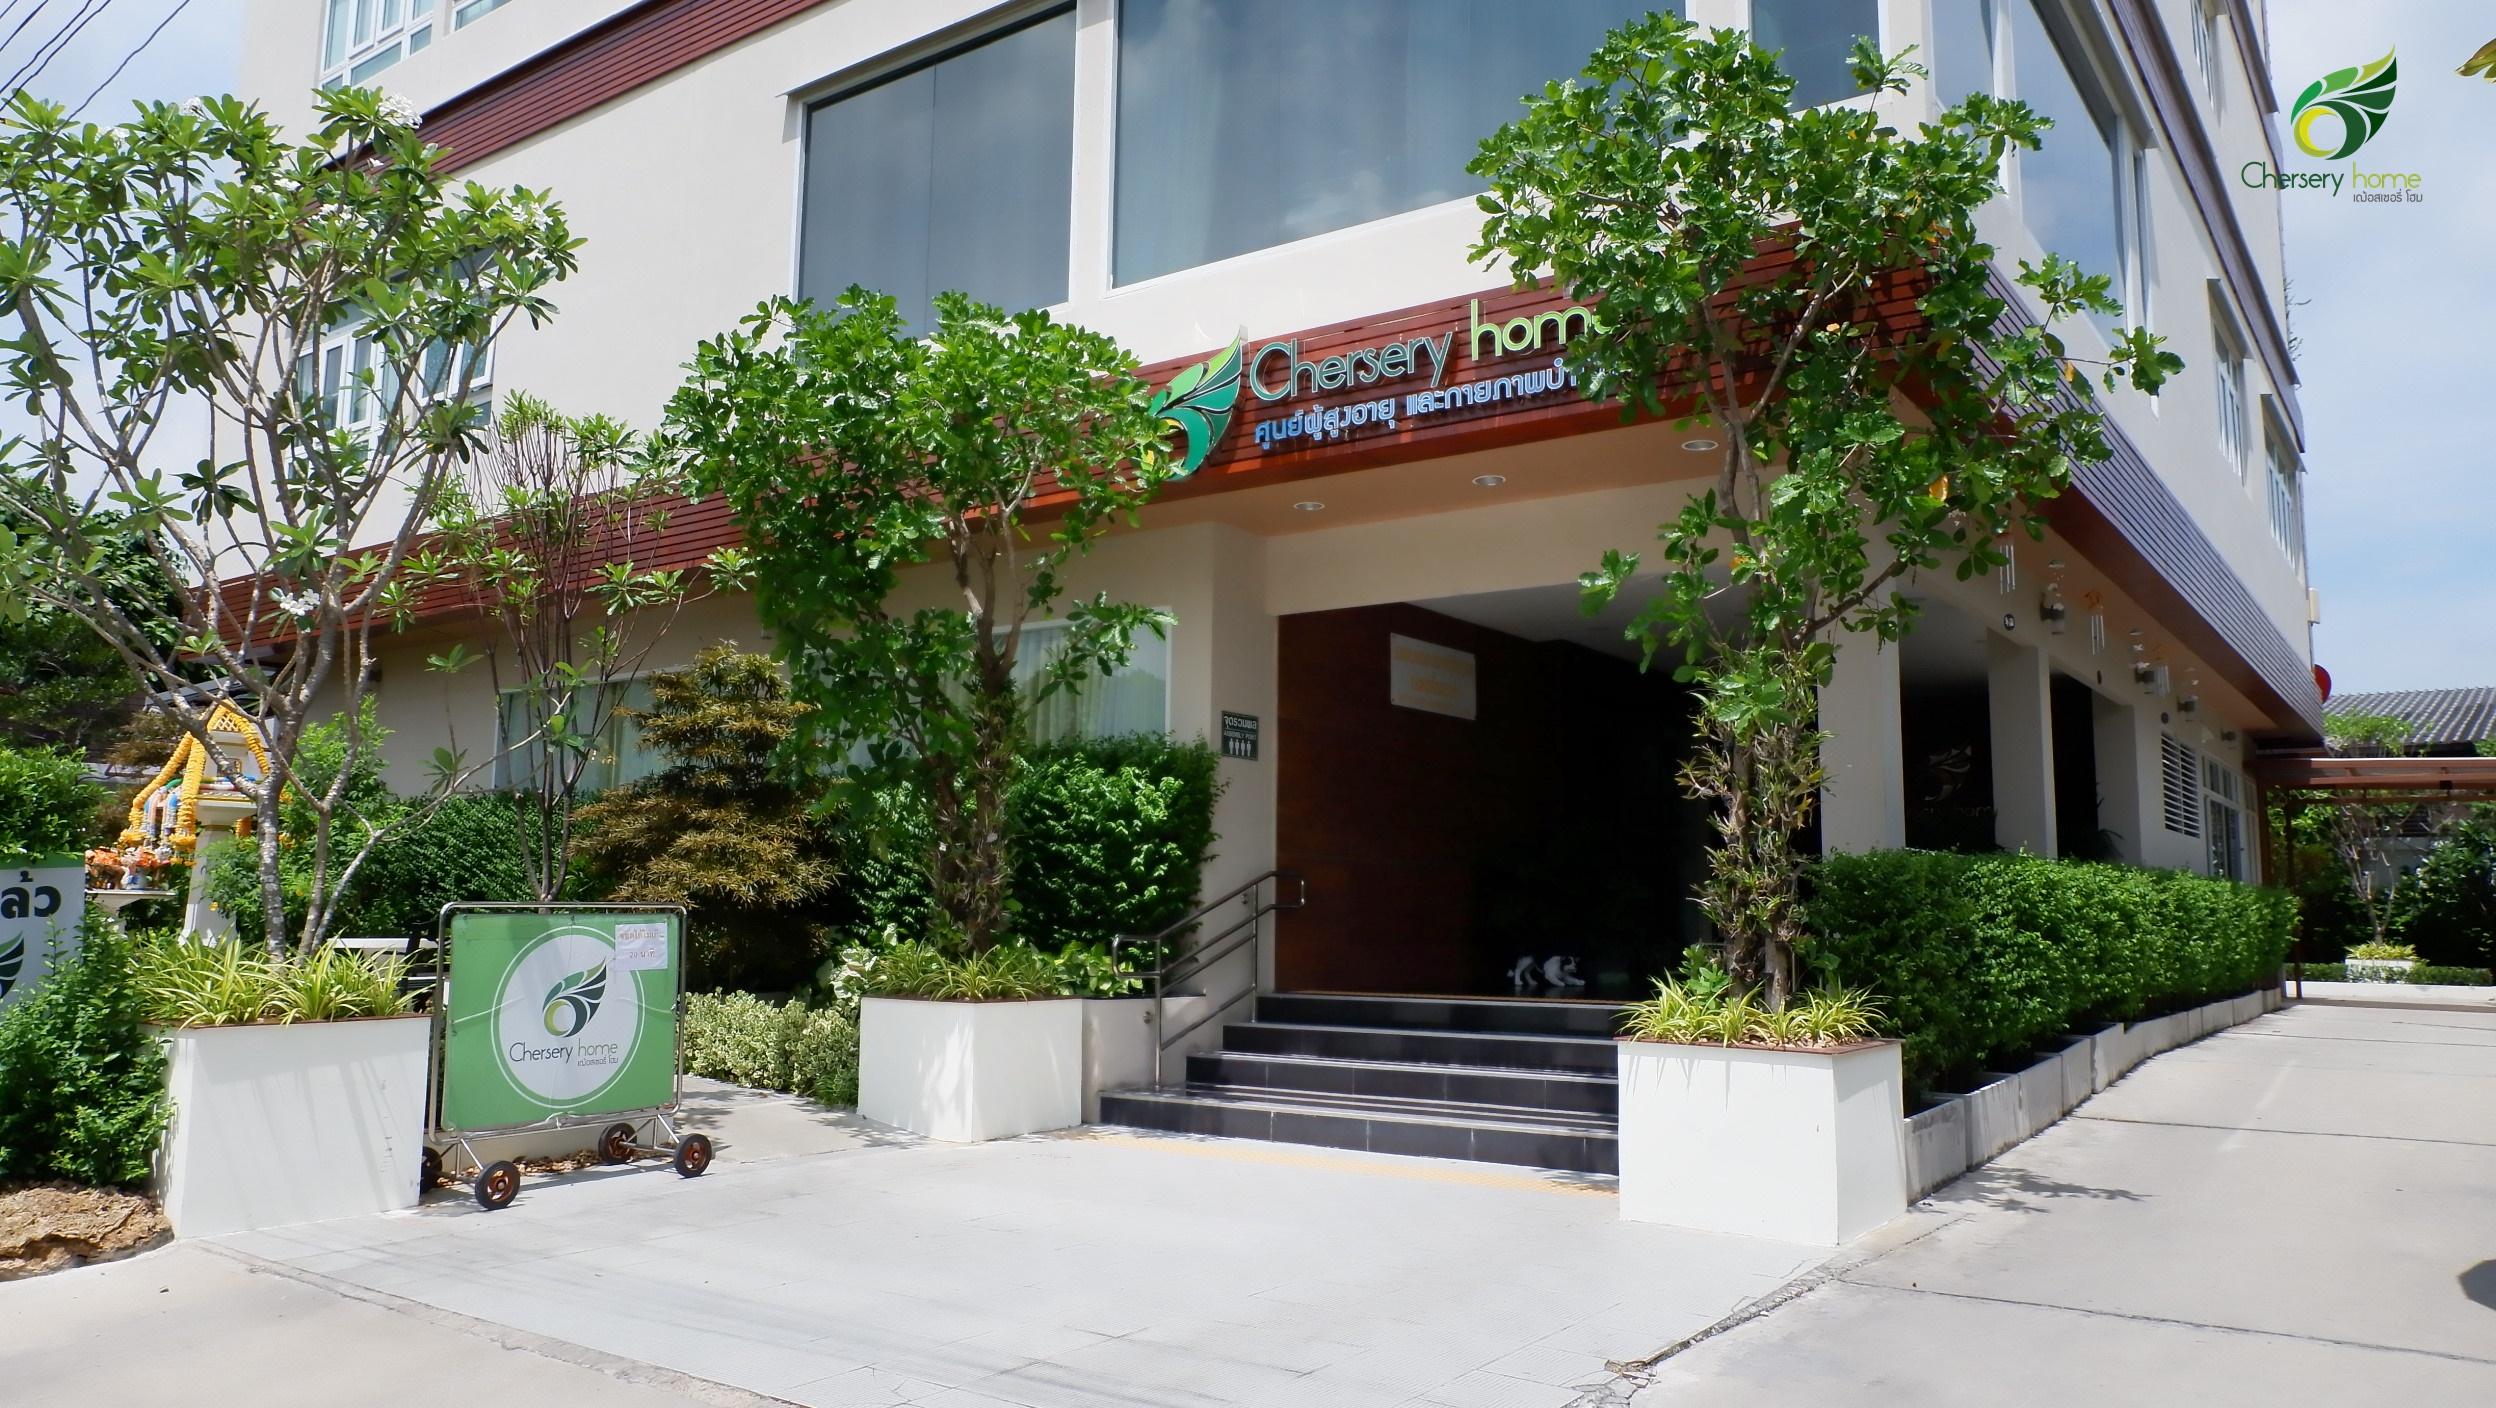 Chersery home โรงพยาบาลผู้สูงอายุและศูนย์กายภาพบำบัด